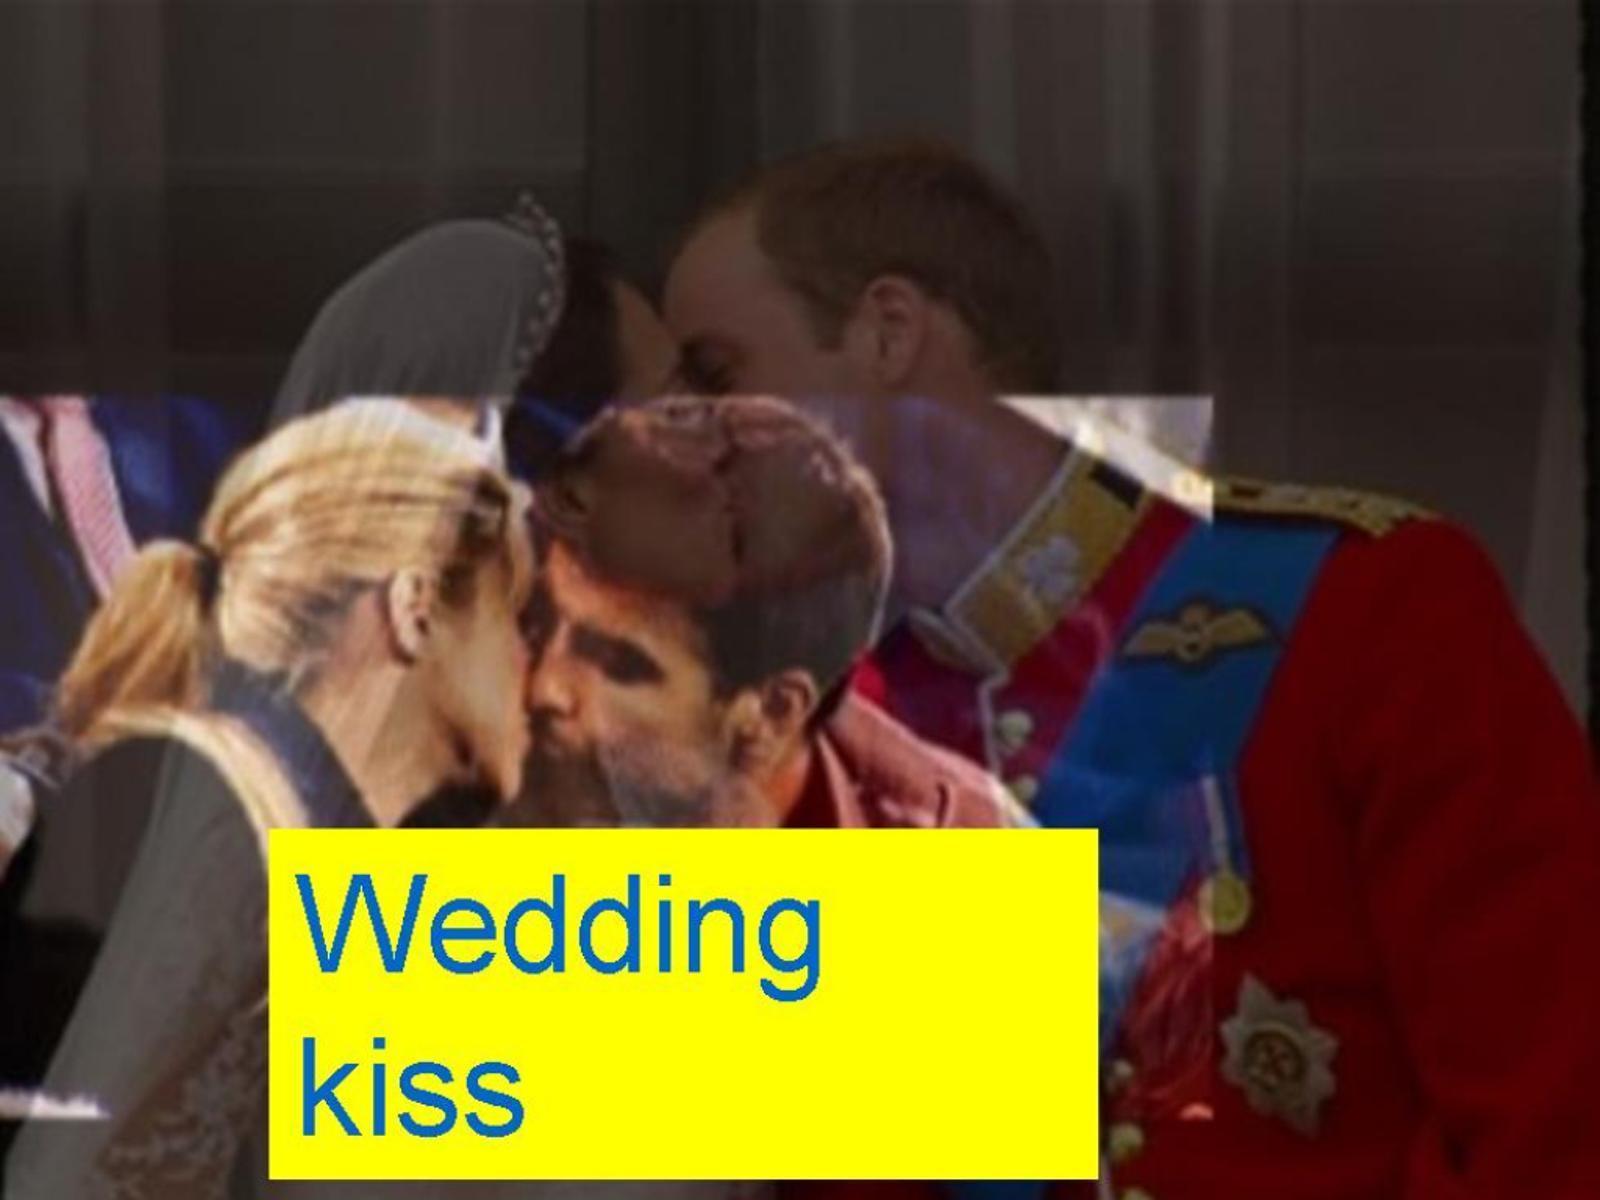 Shakira and Piqué wedding kiss